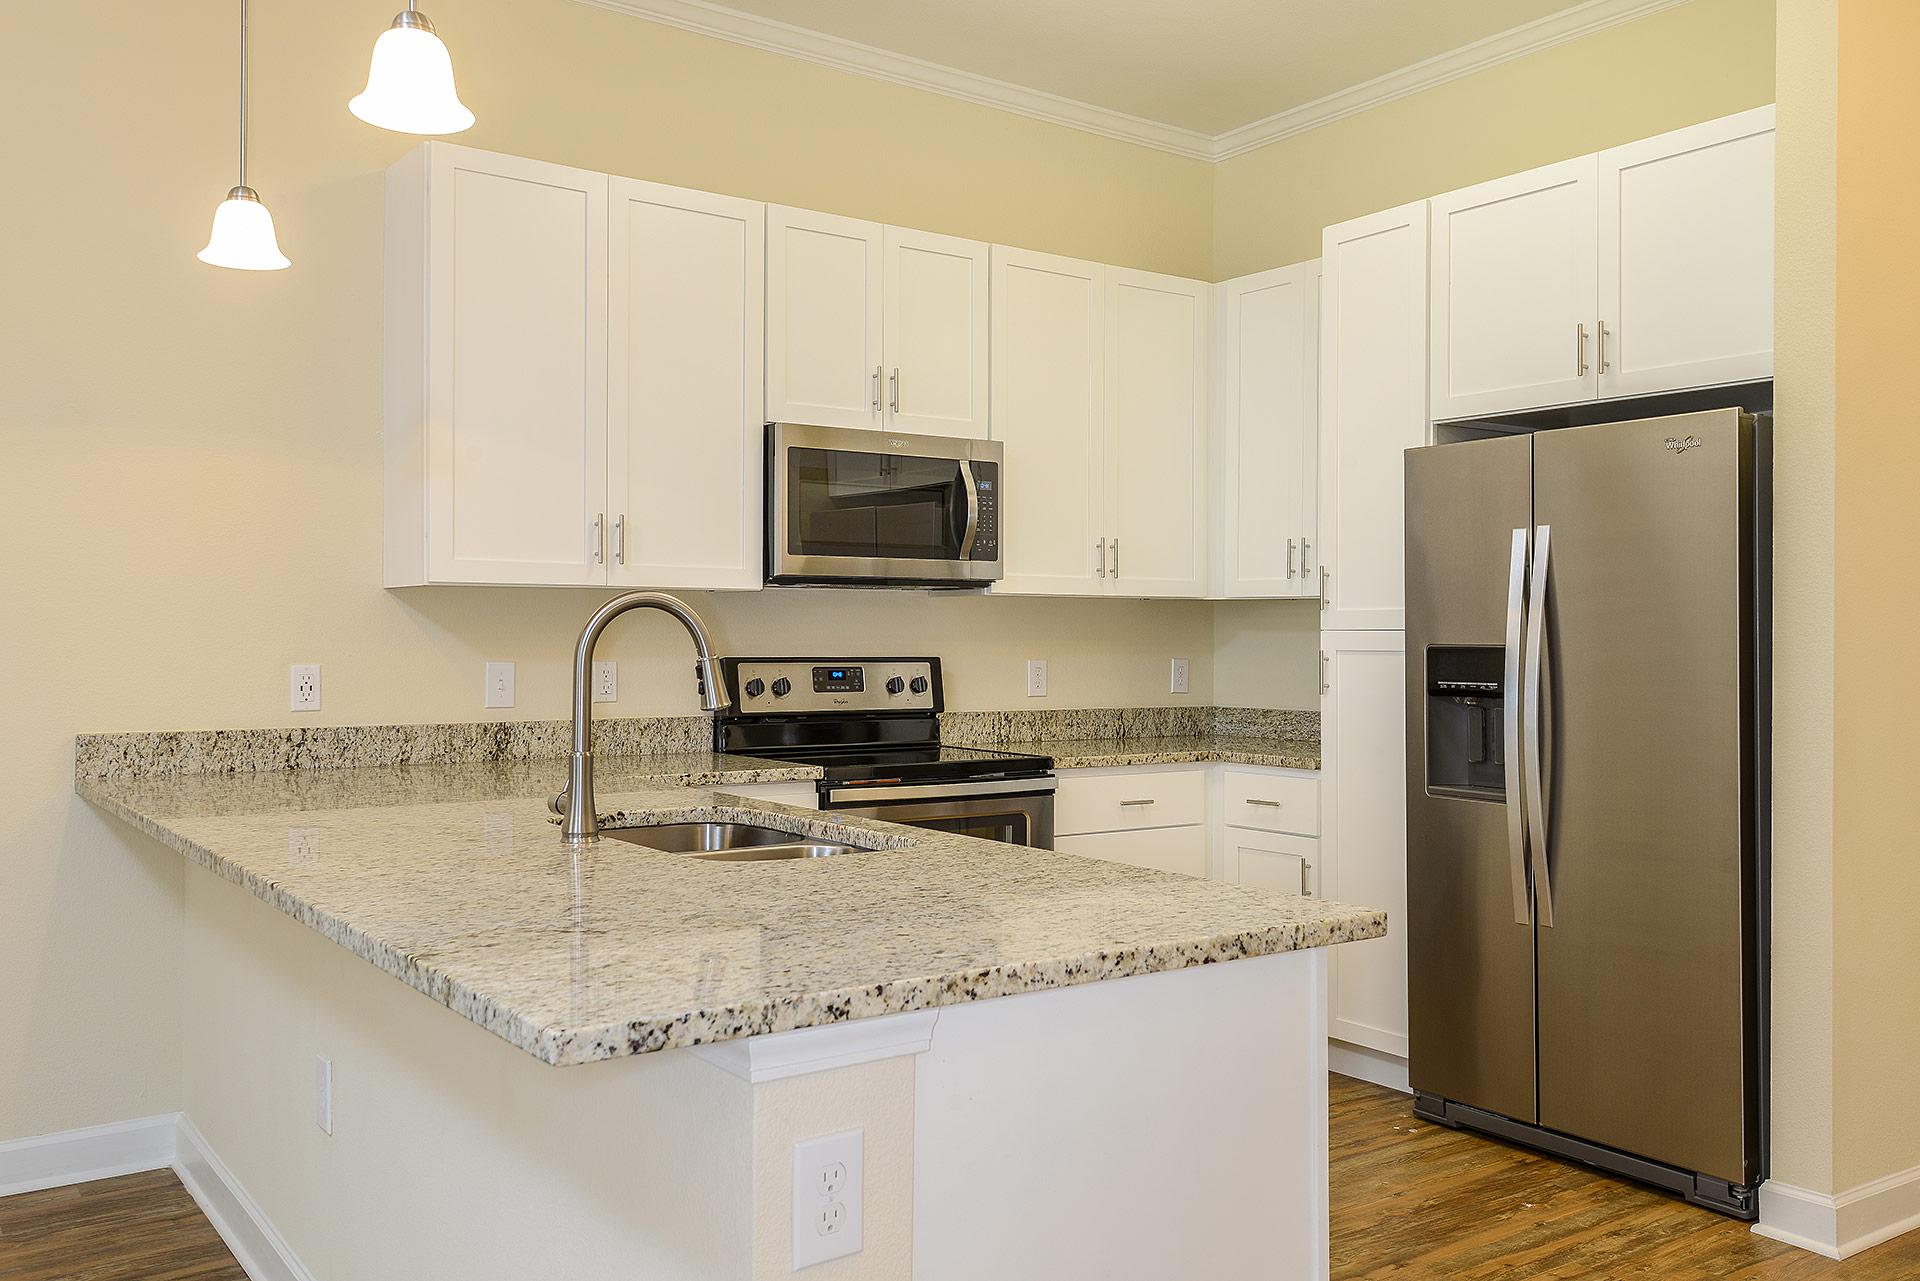 Wooden floor empty unit with kitchen